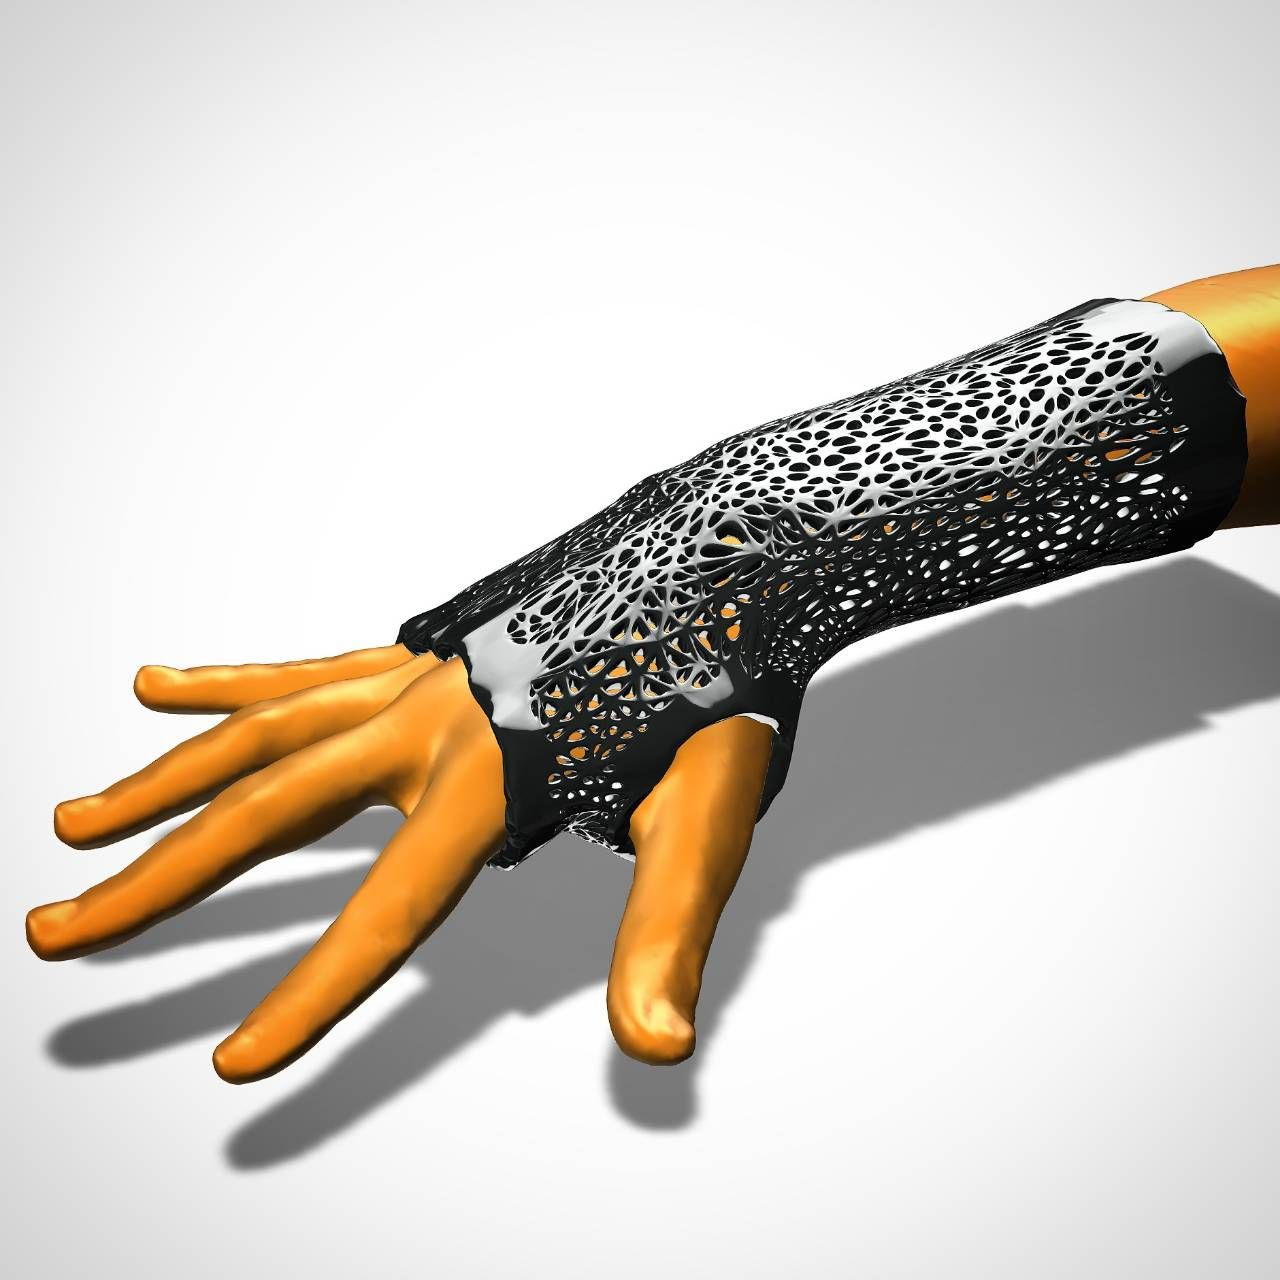 Arm splint model with Voronoi perforation pattern  Design based on